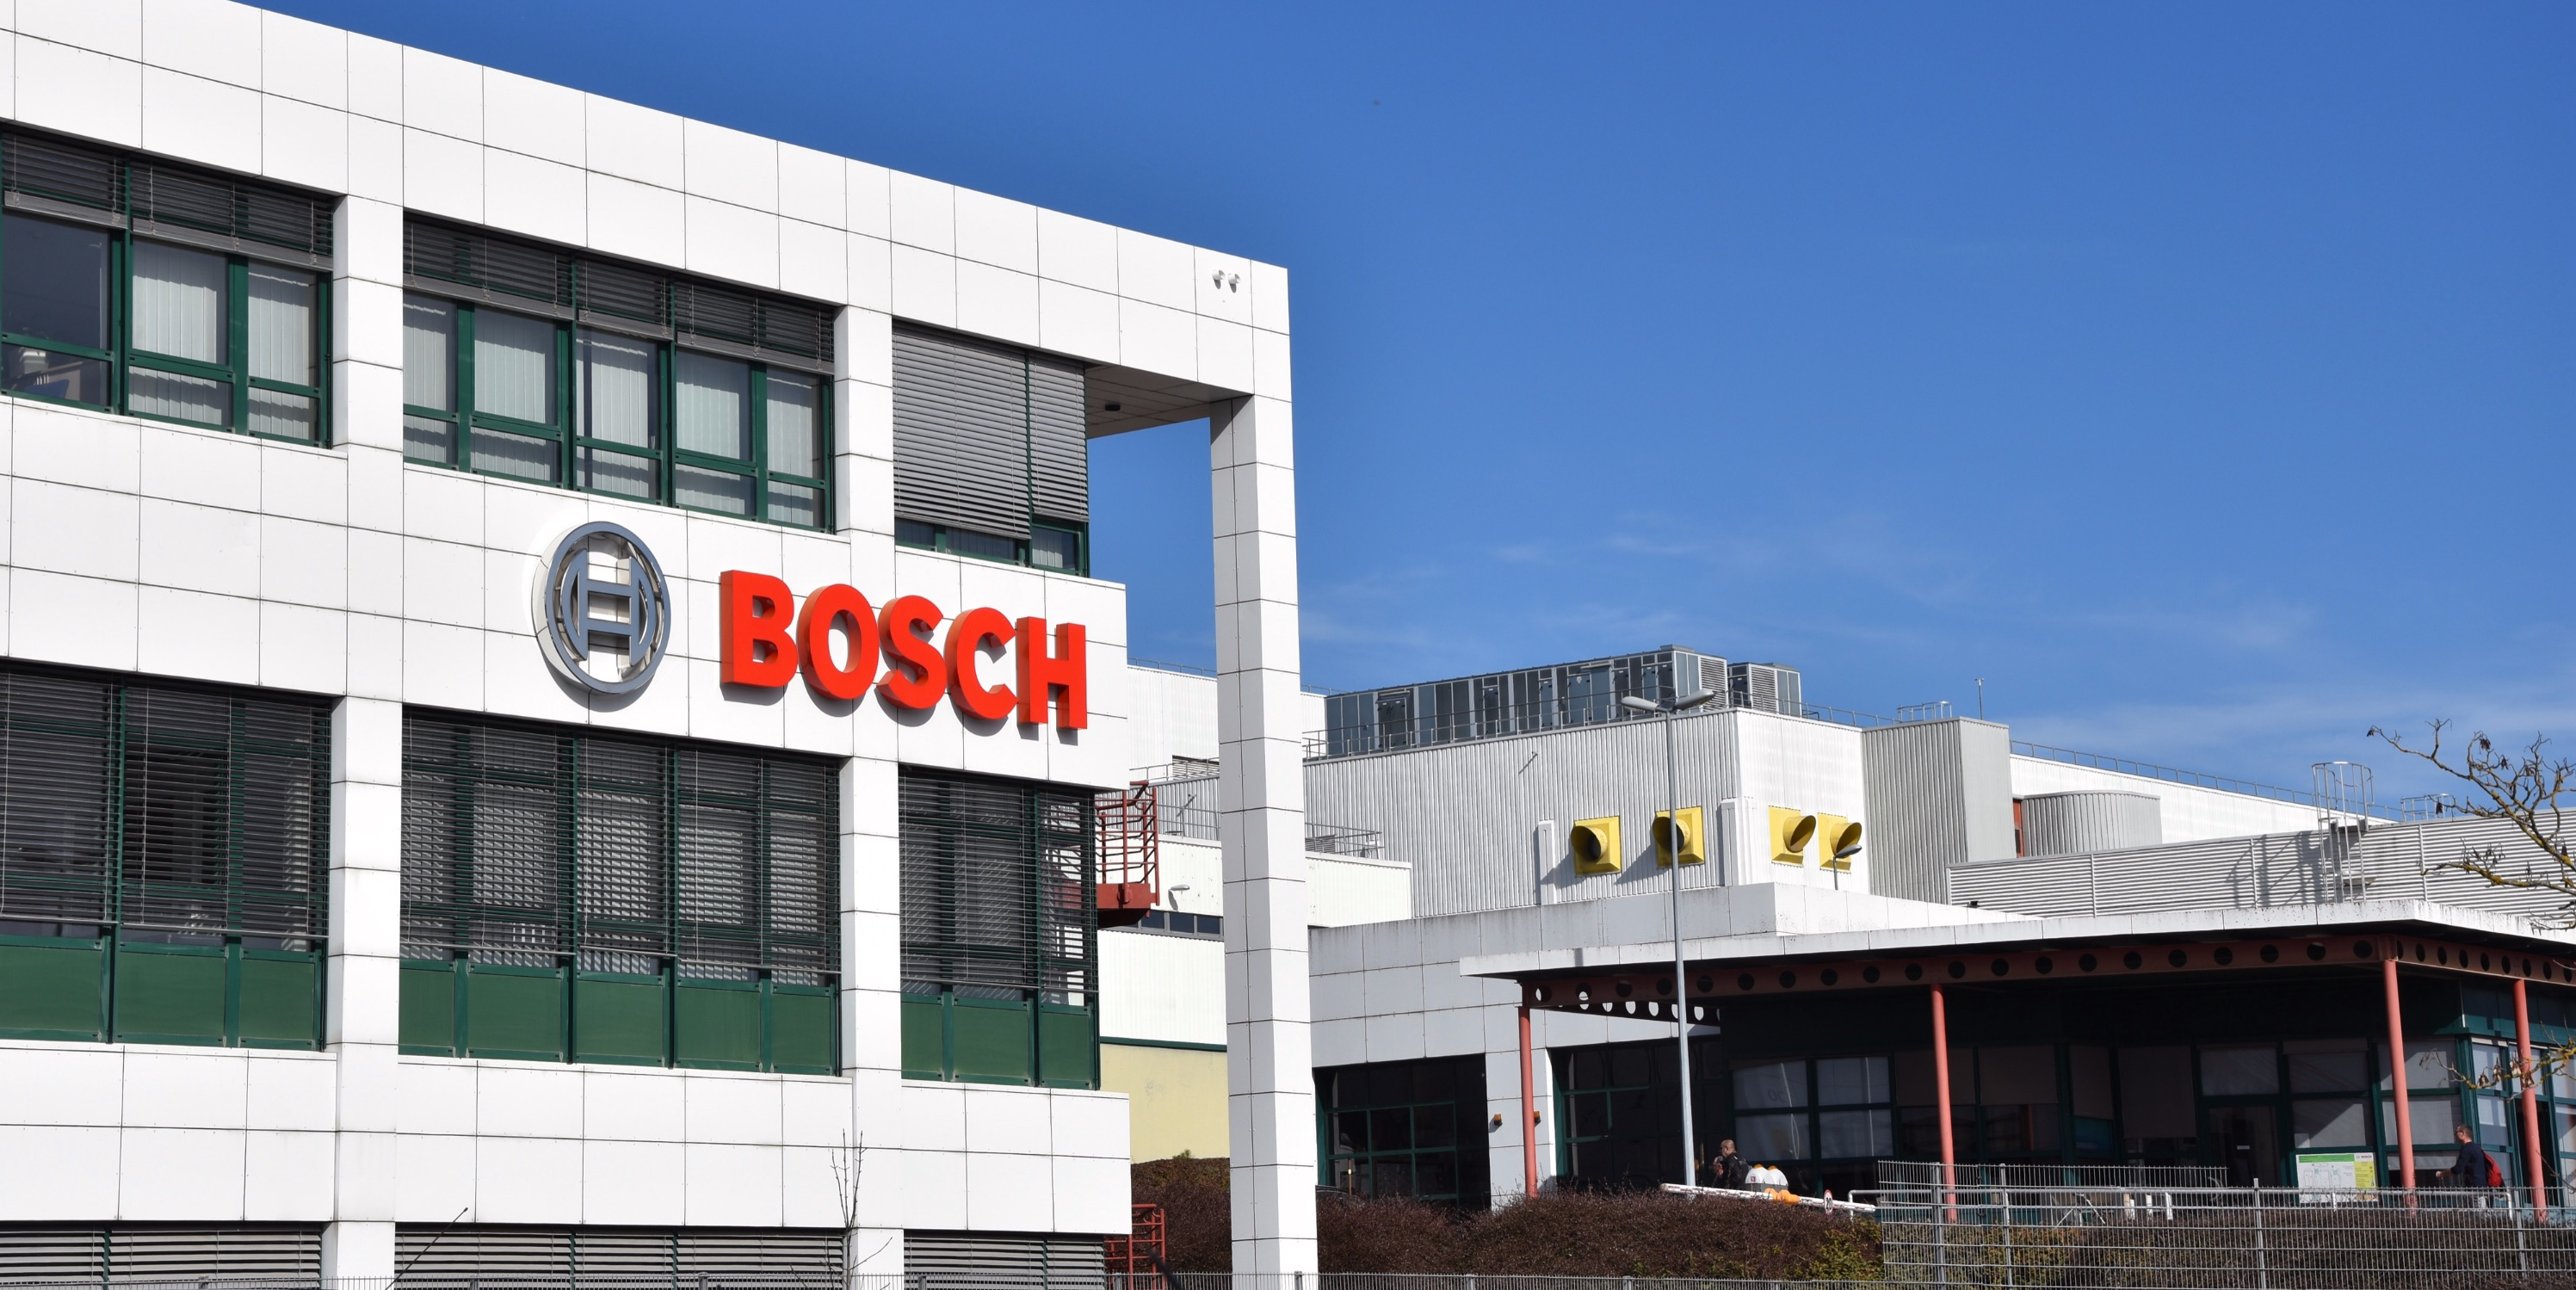 Rodez Emmanuel Macron Espere A La Bosch